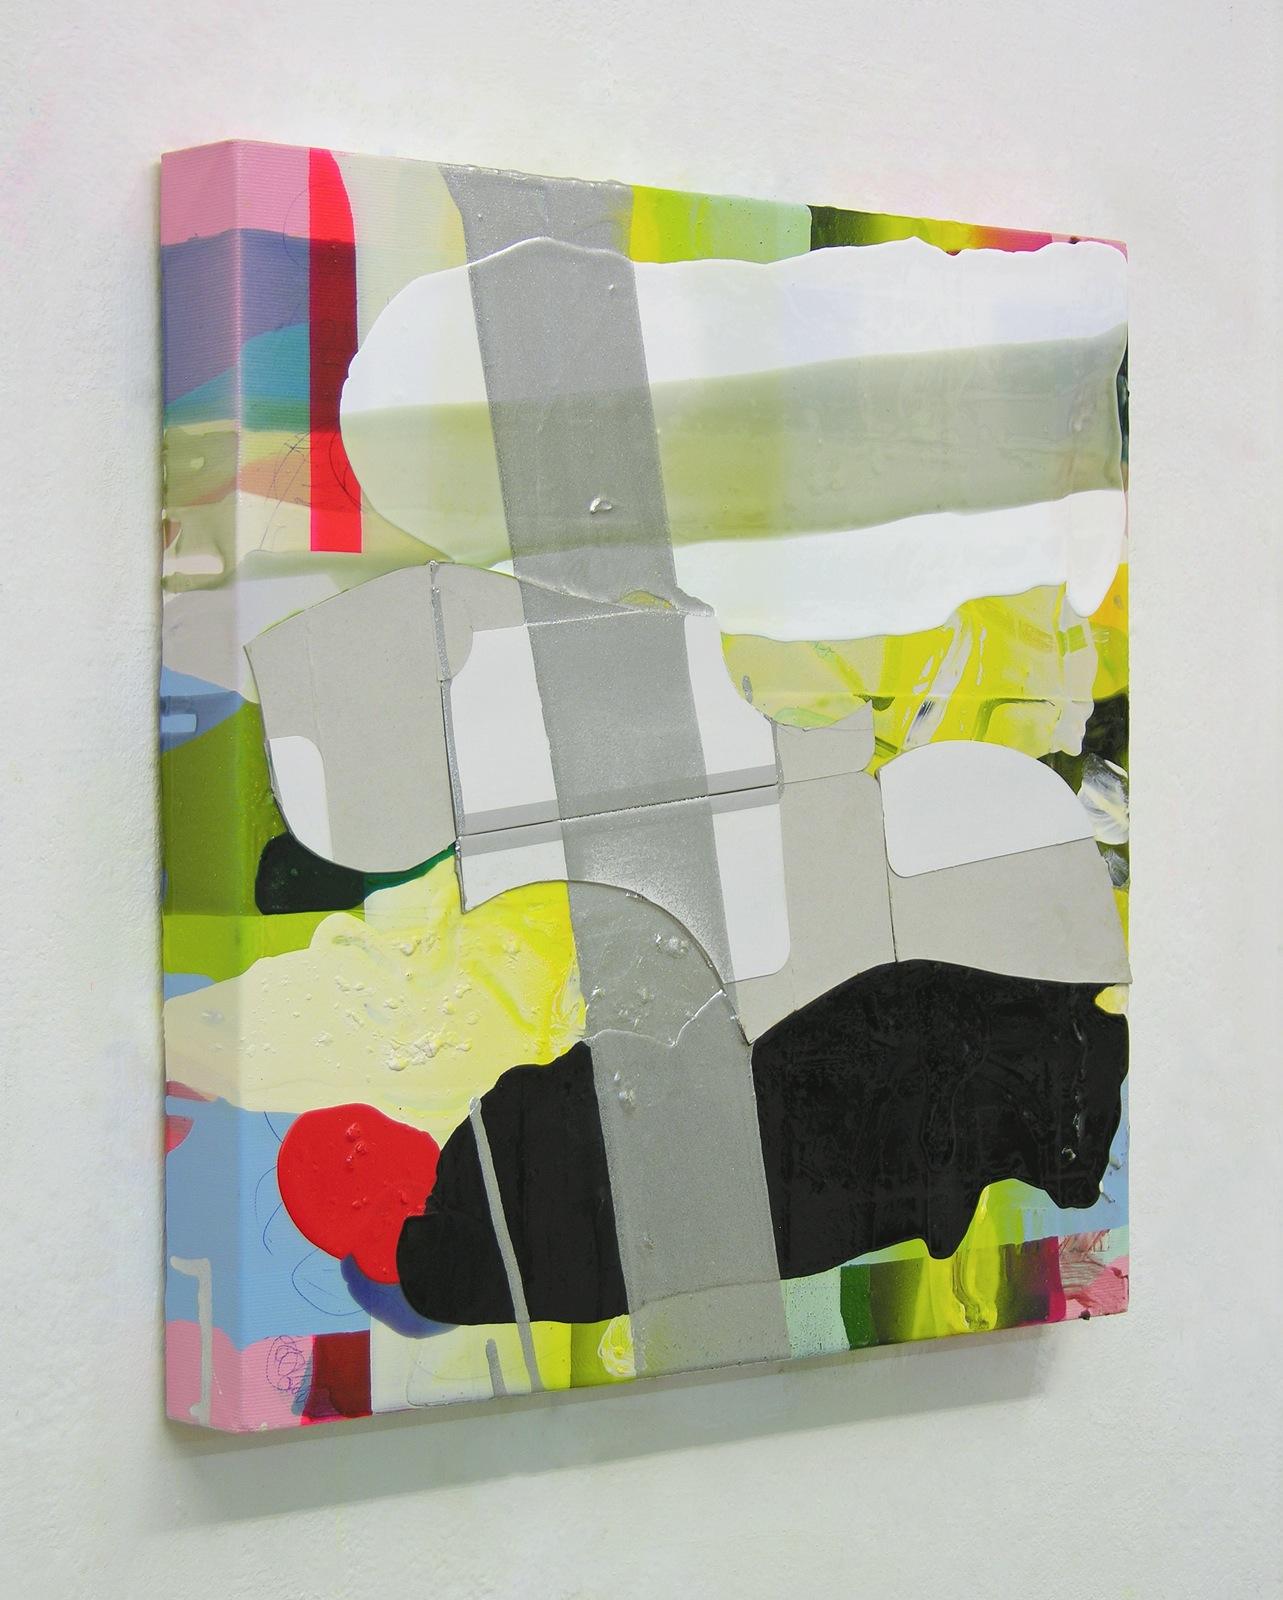 Quadrat o.T., 40x40 cm, Acryllack, Papier, Leinwand, 2005